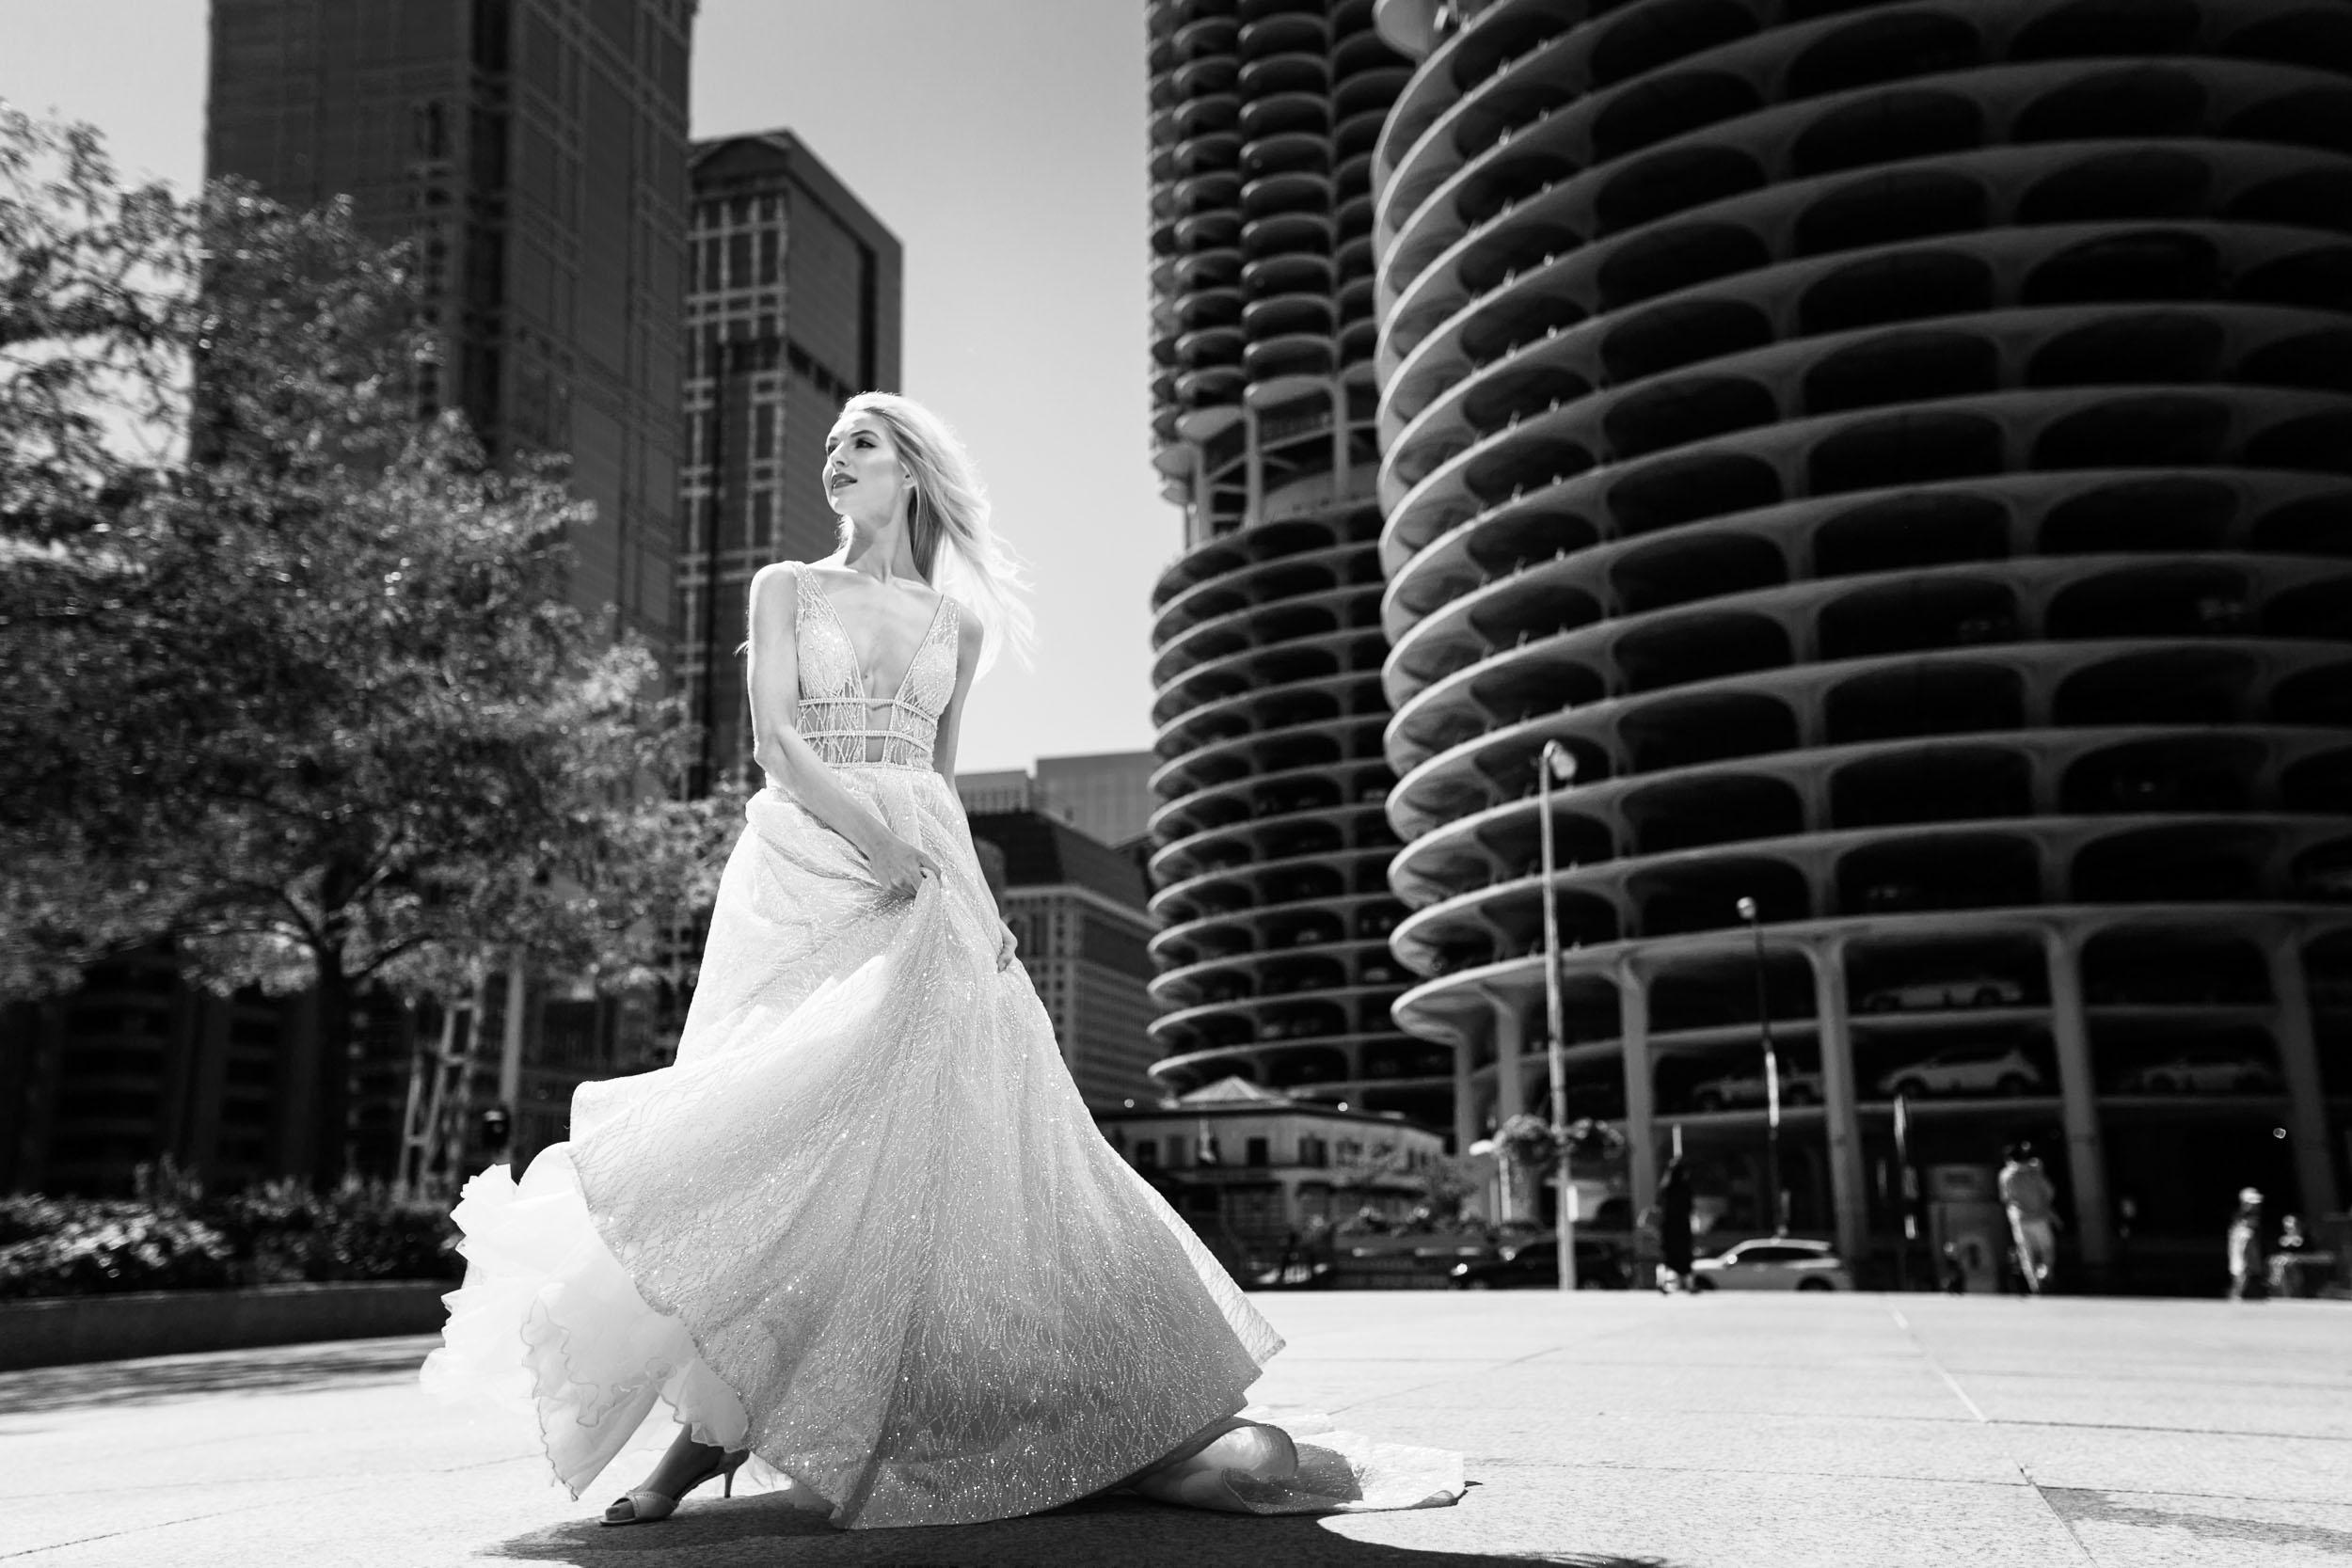 chicago-illuminating-co-wedding-photos-28.jpg